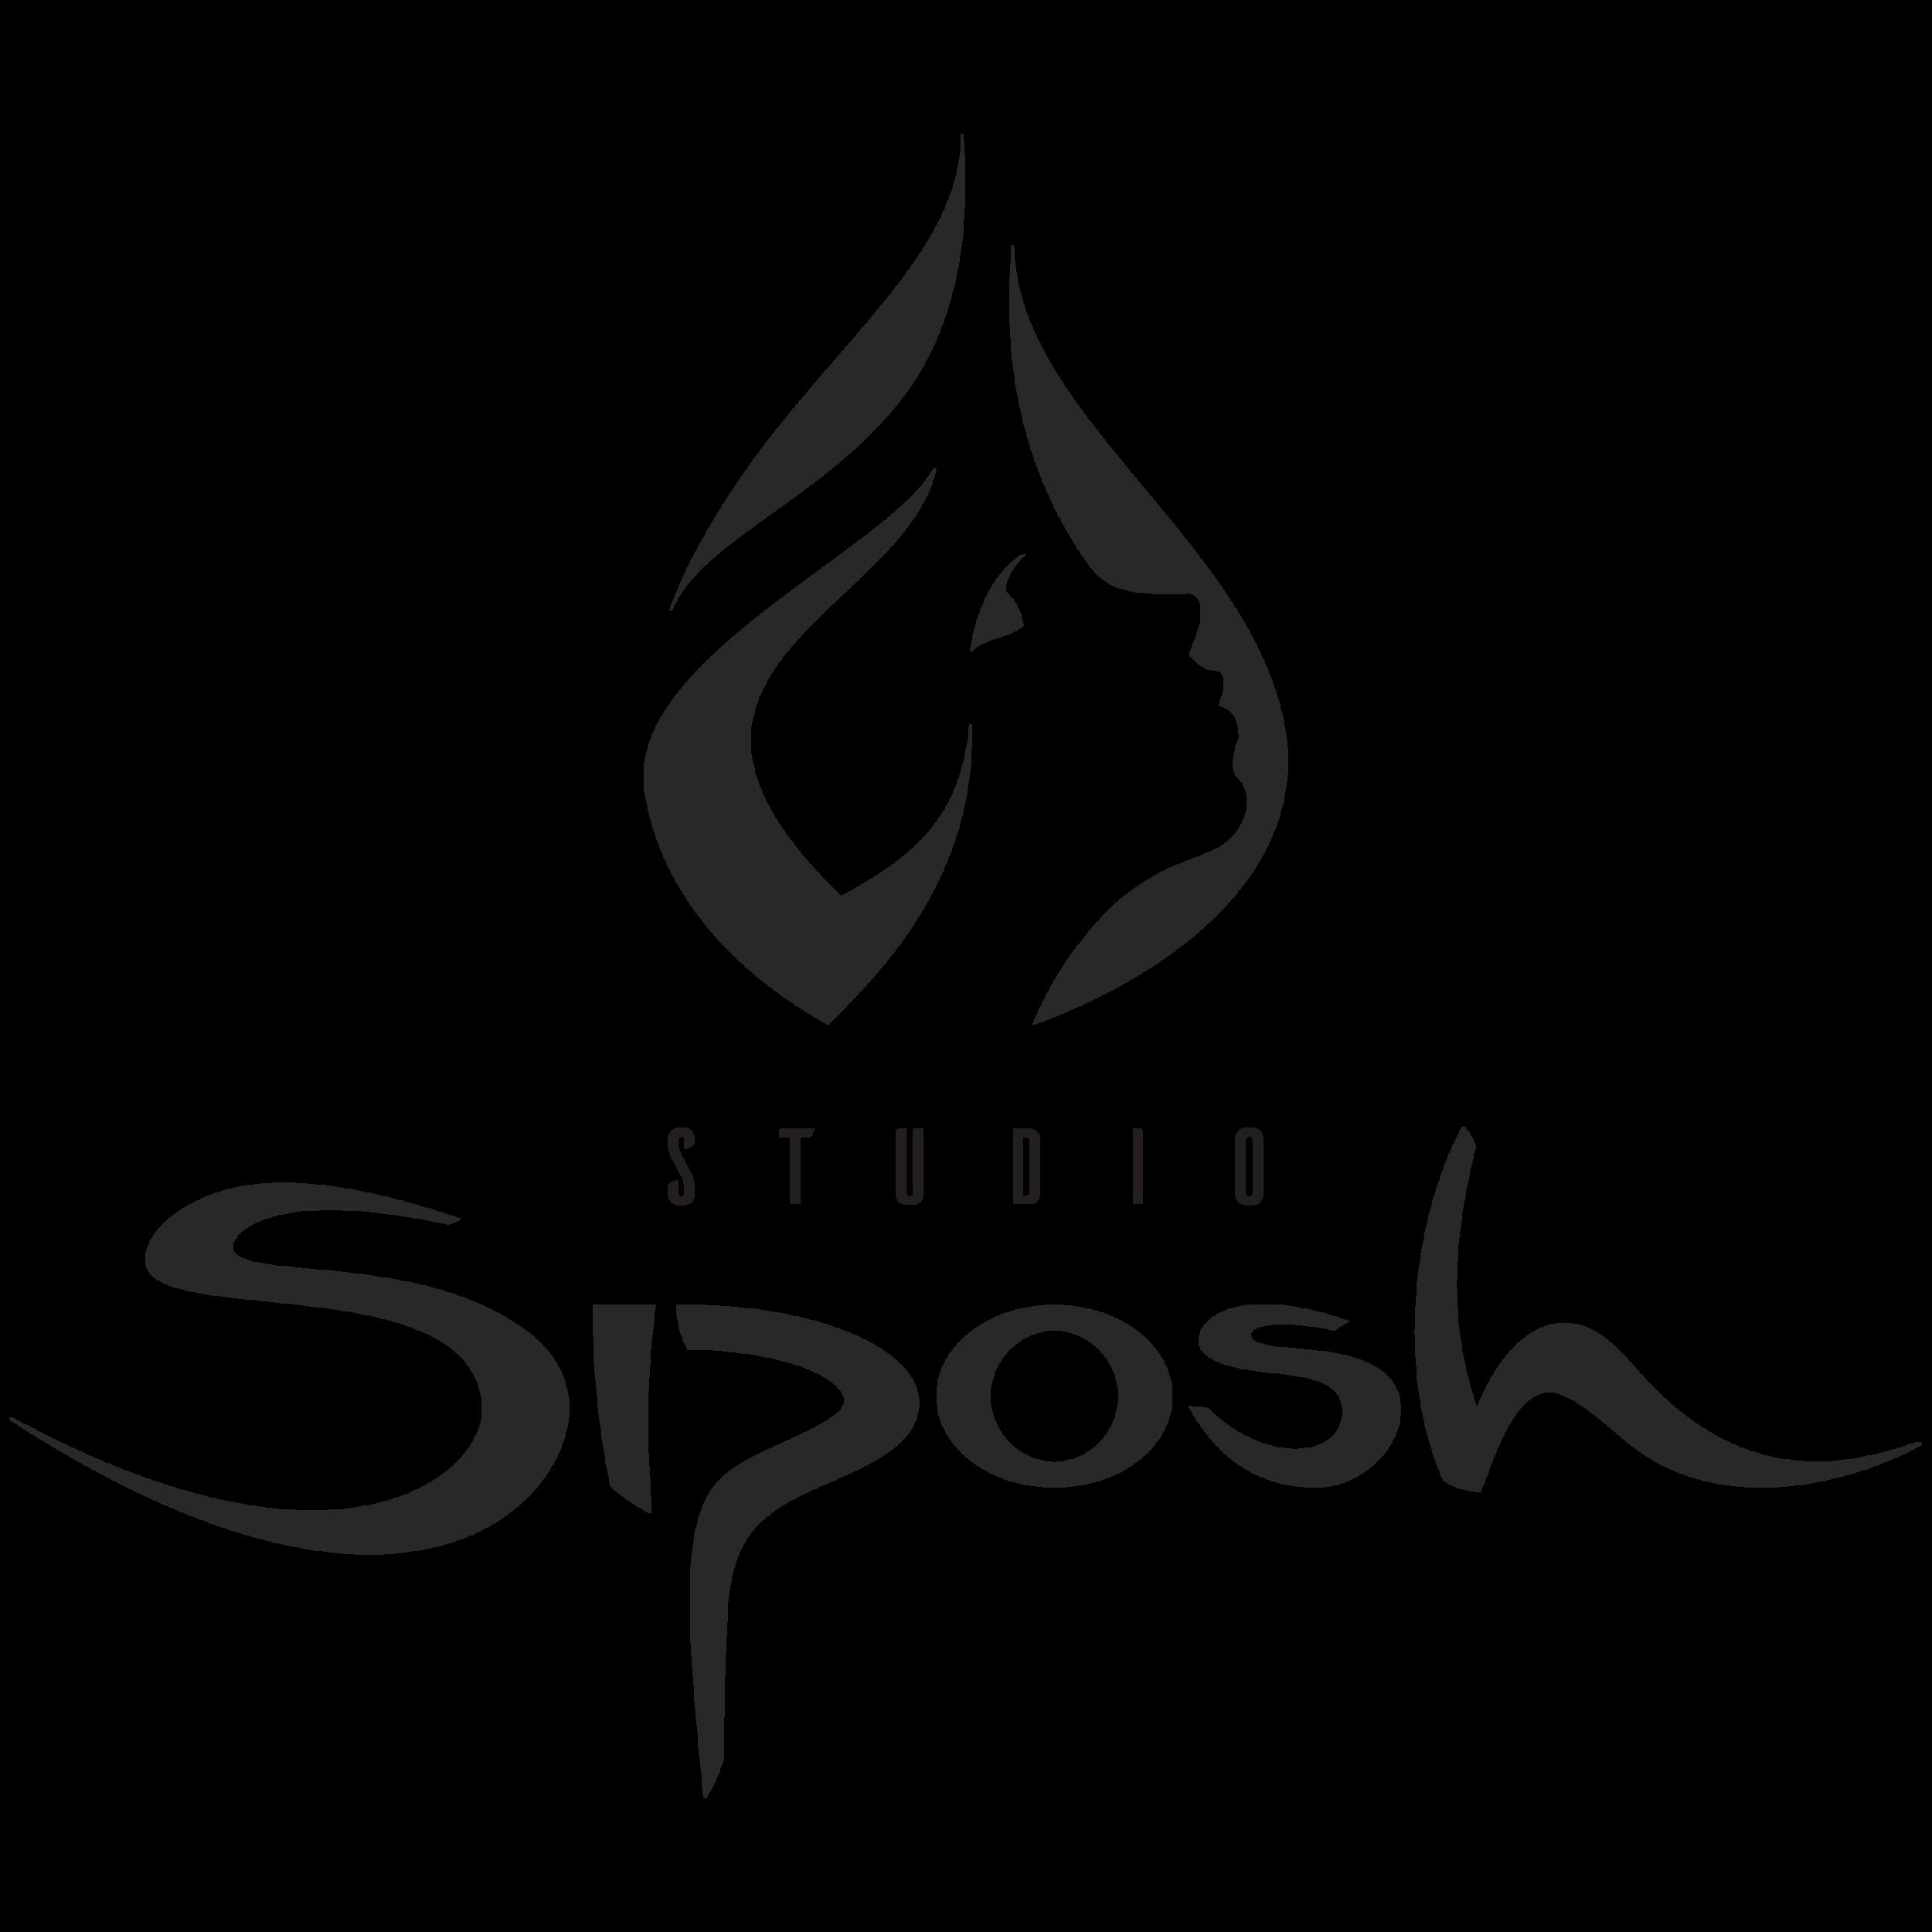 Siposh logo 4.png